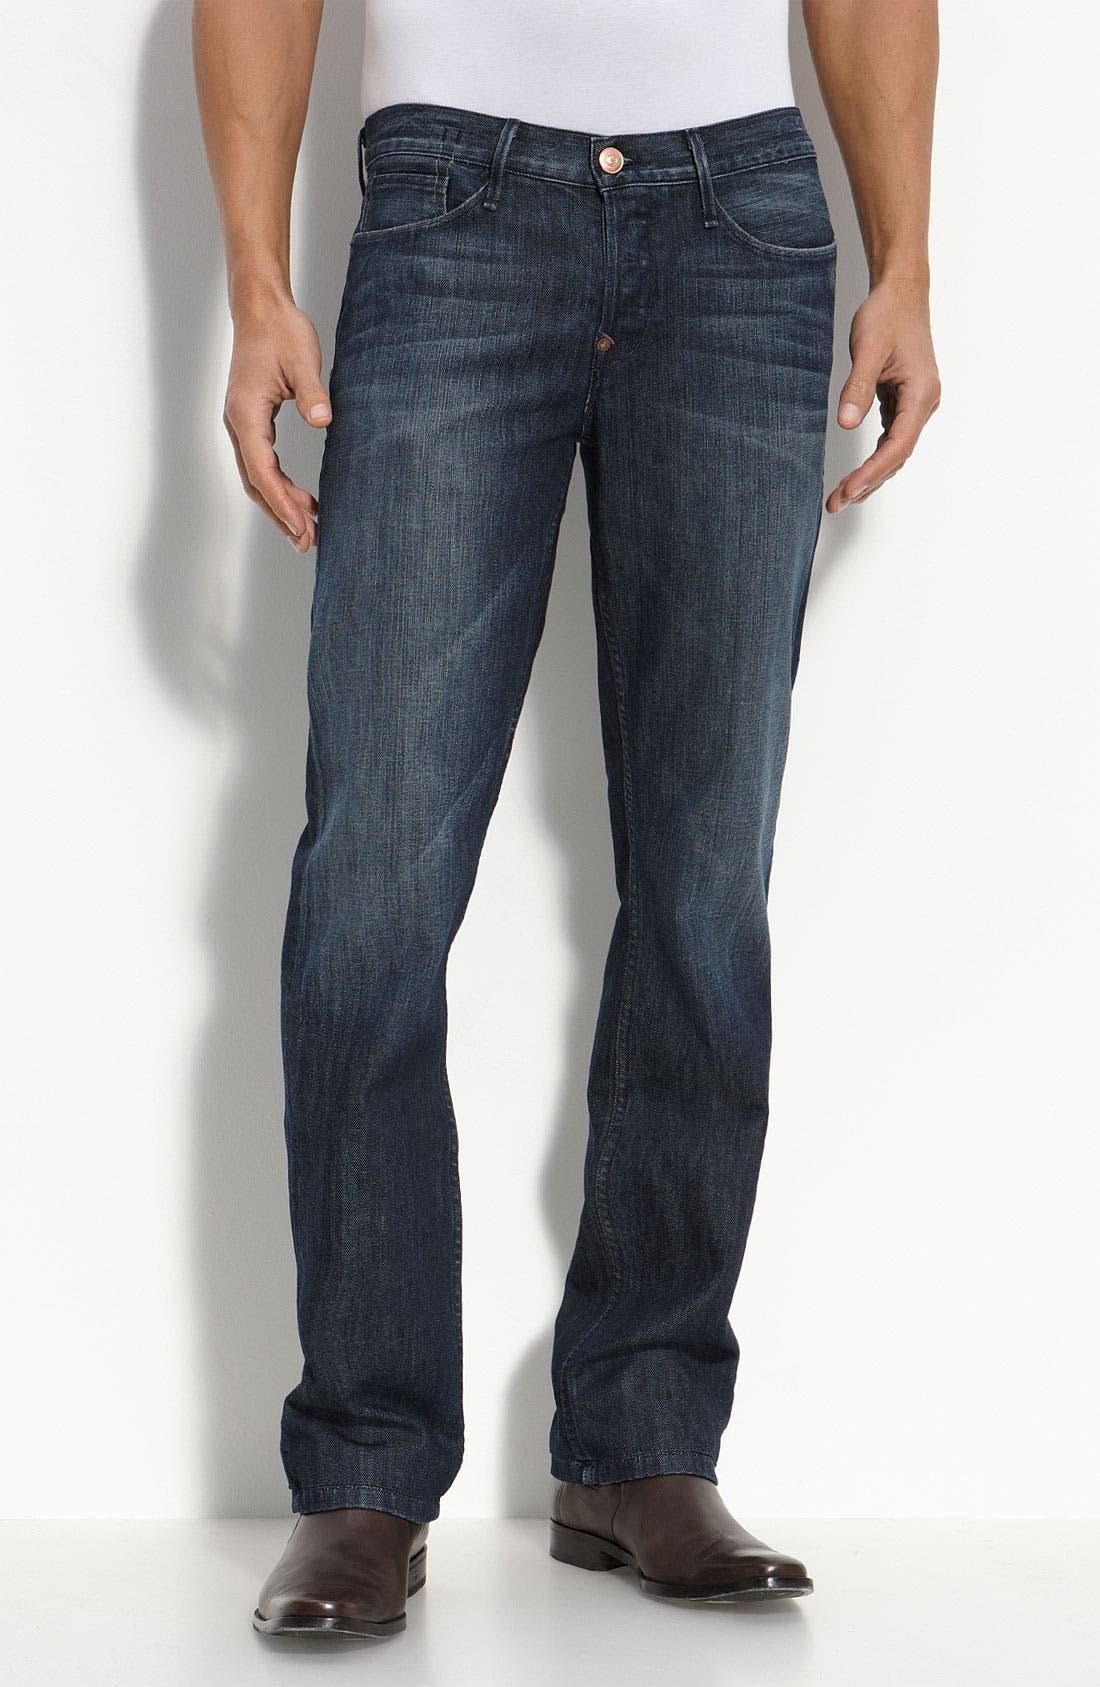 Alternate Image 1 Selected - Earnest Sewn 'Fulton' Straight Leg Jeans (Parker)